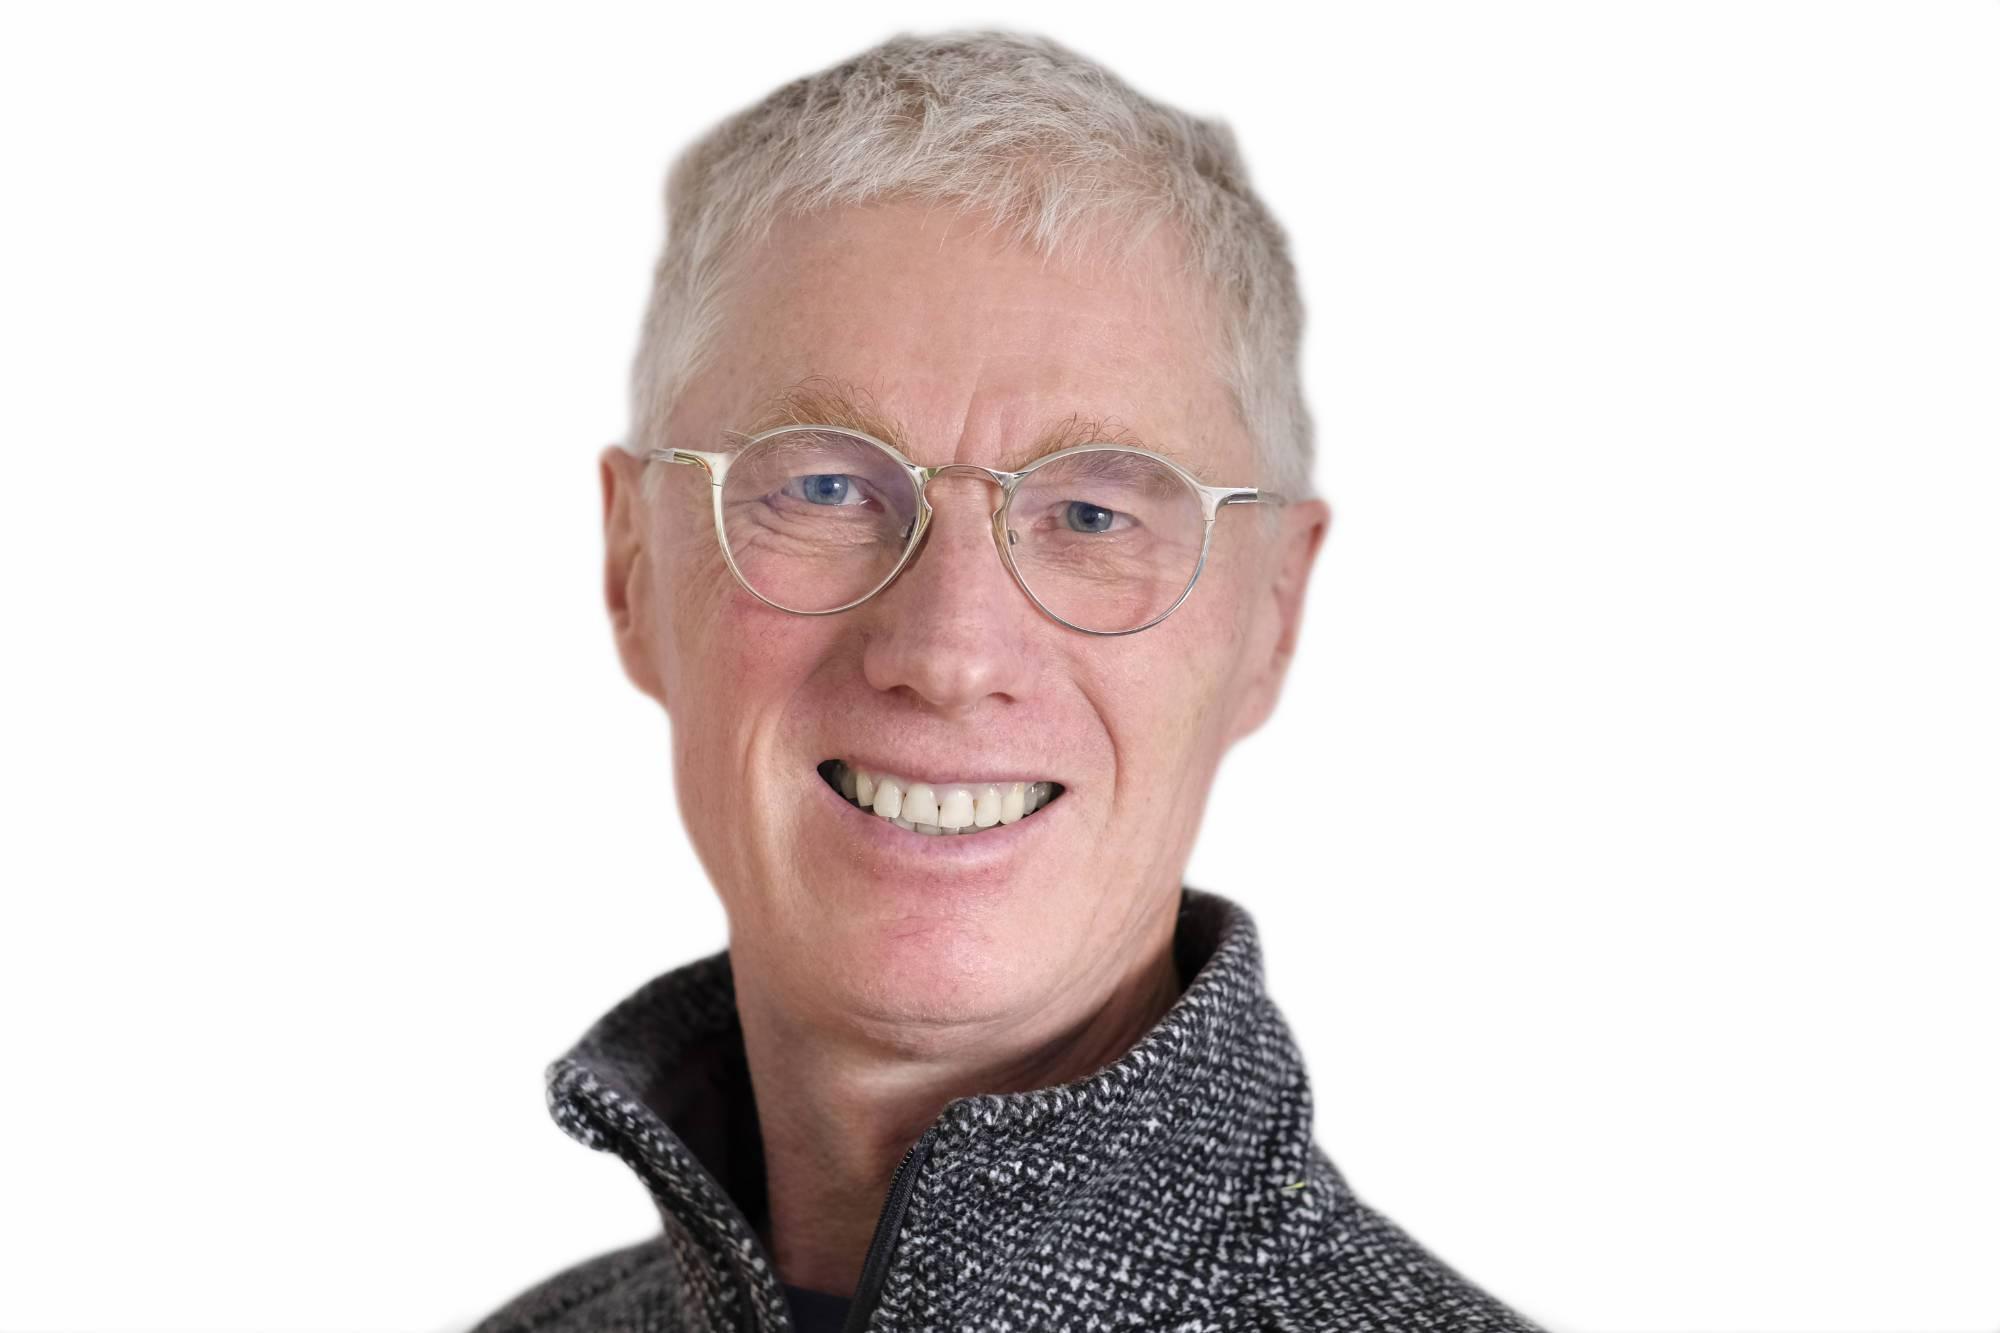 Juri Weiss, DR SCHTiFFT